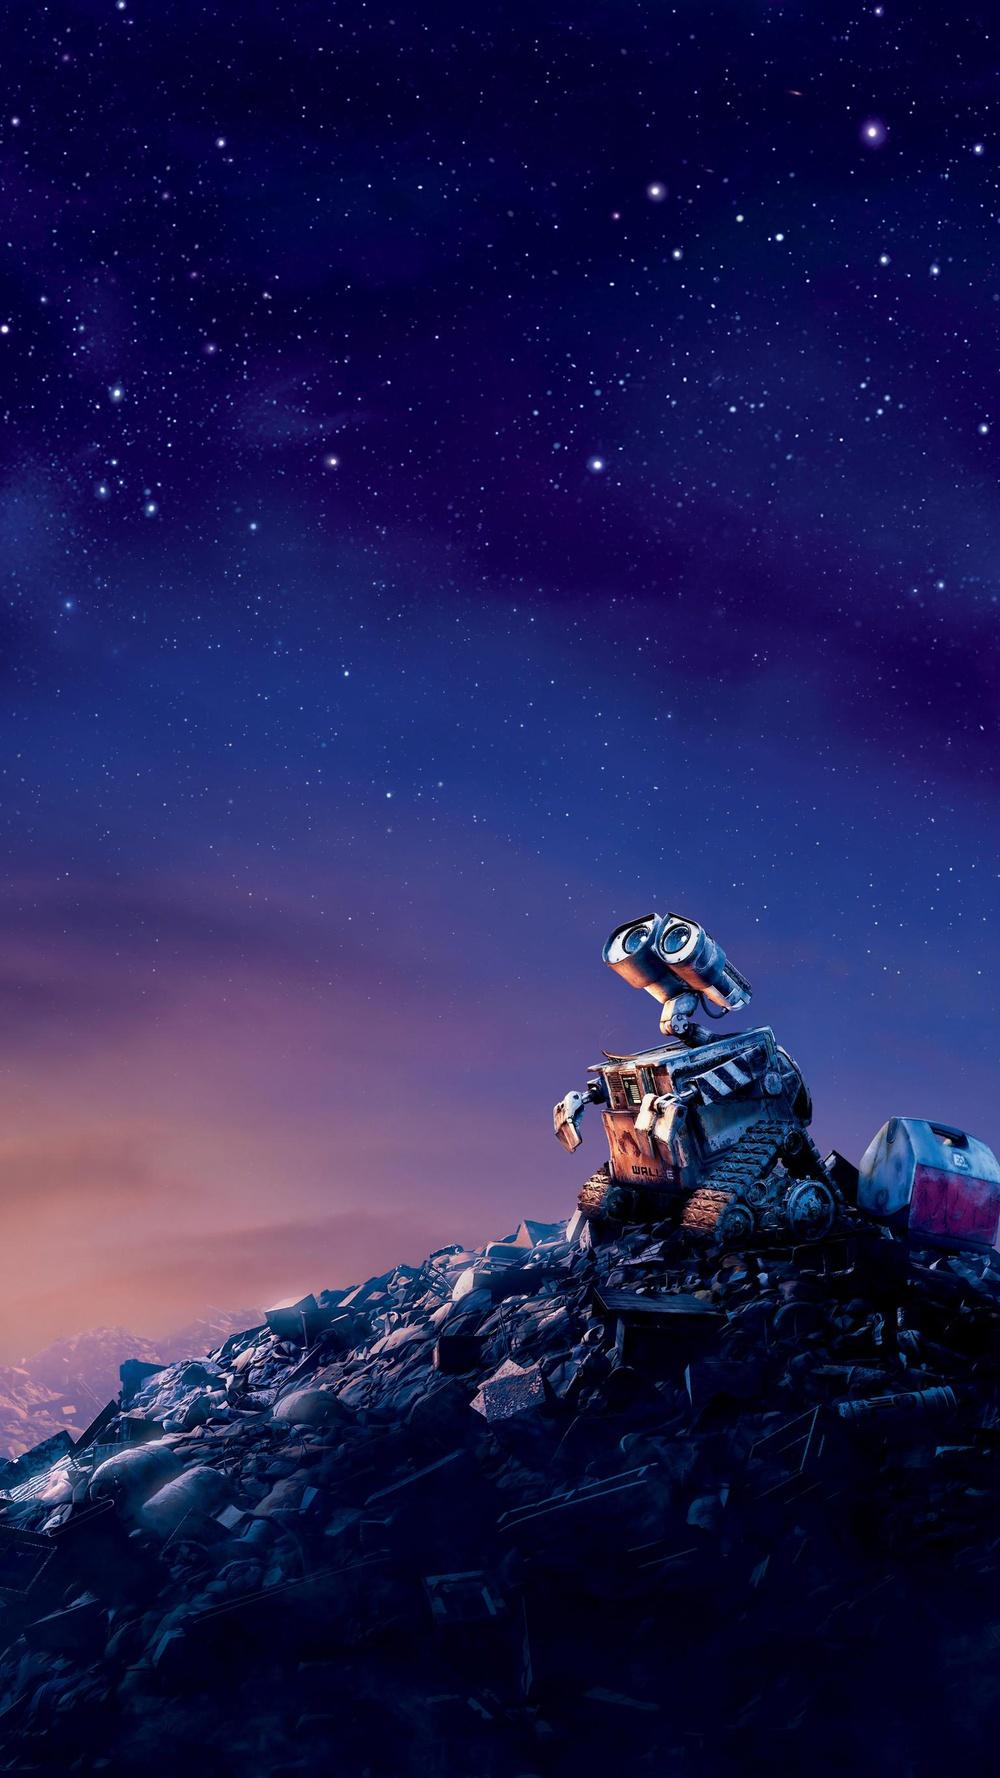 Pixar has a  Storytelling Formula